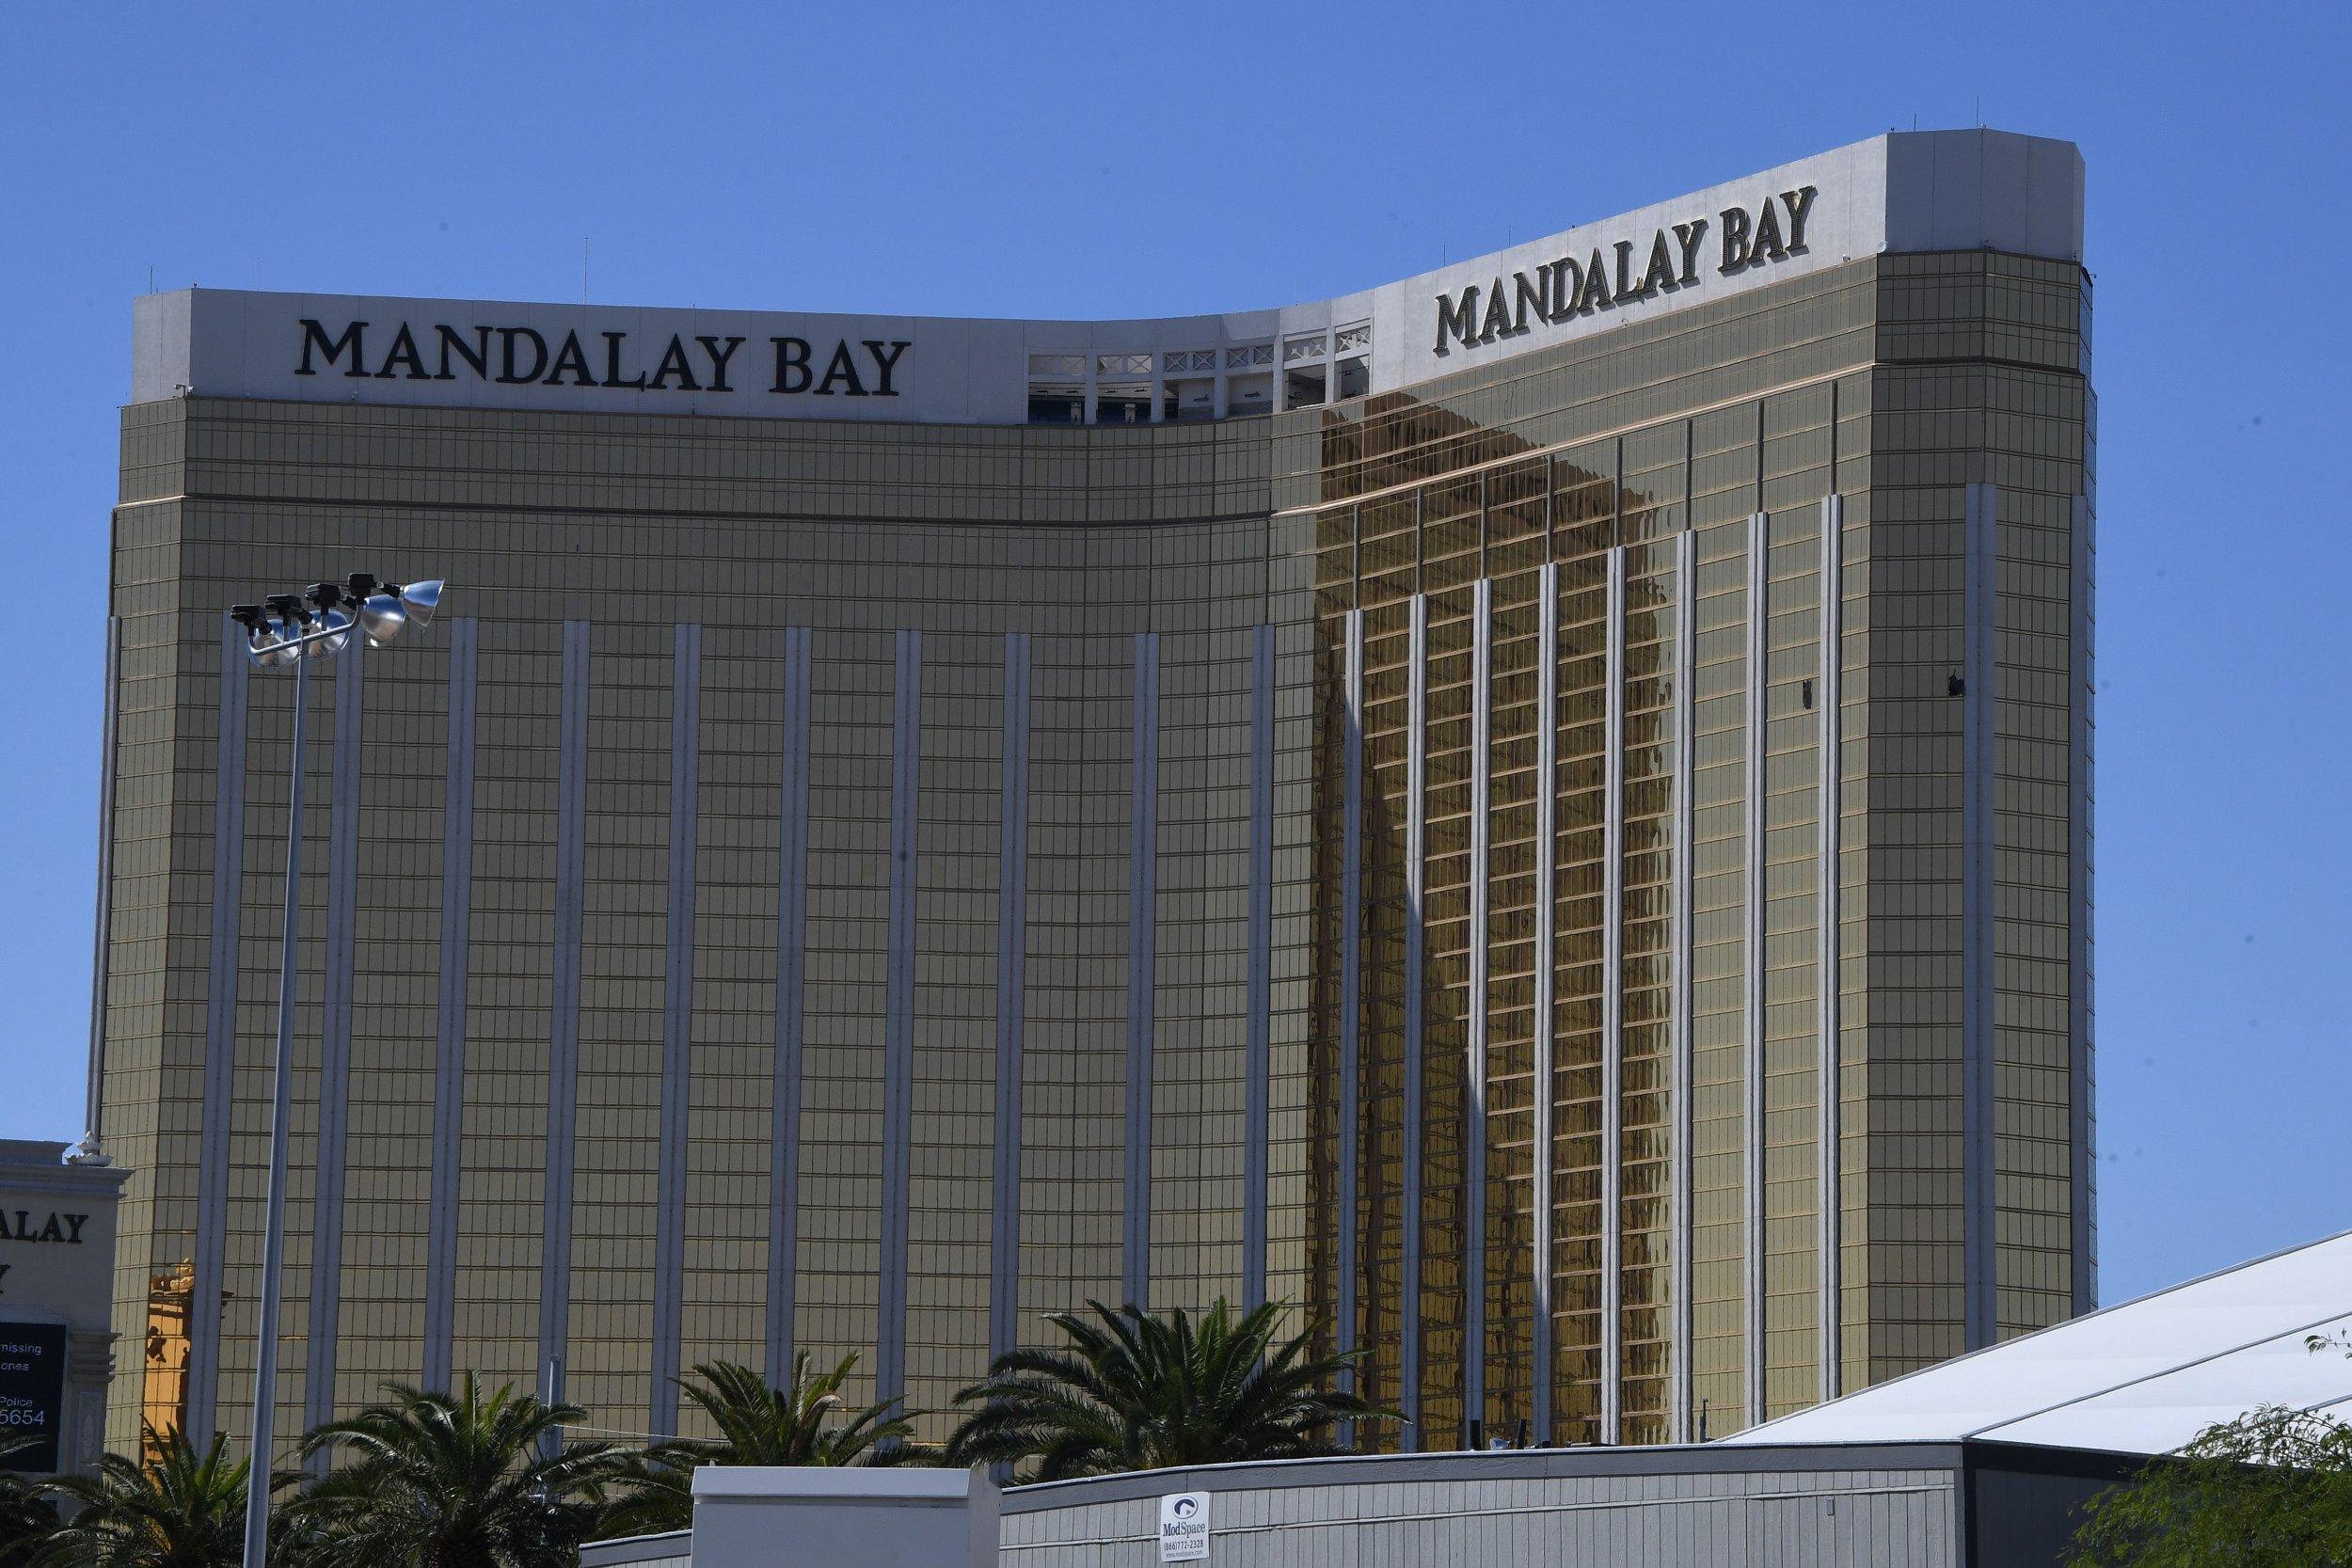 Las Vegas Shooter Stephen Paddock Kept Staring At Mandalay